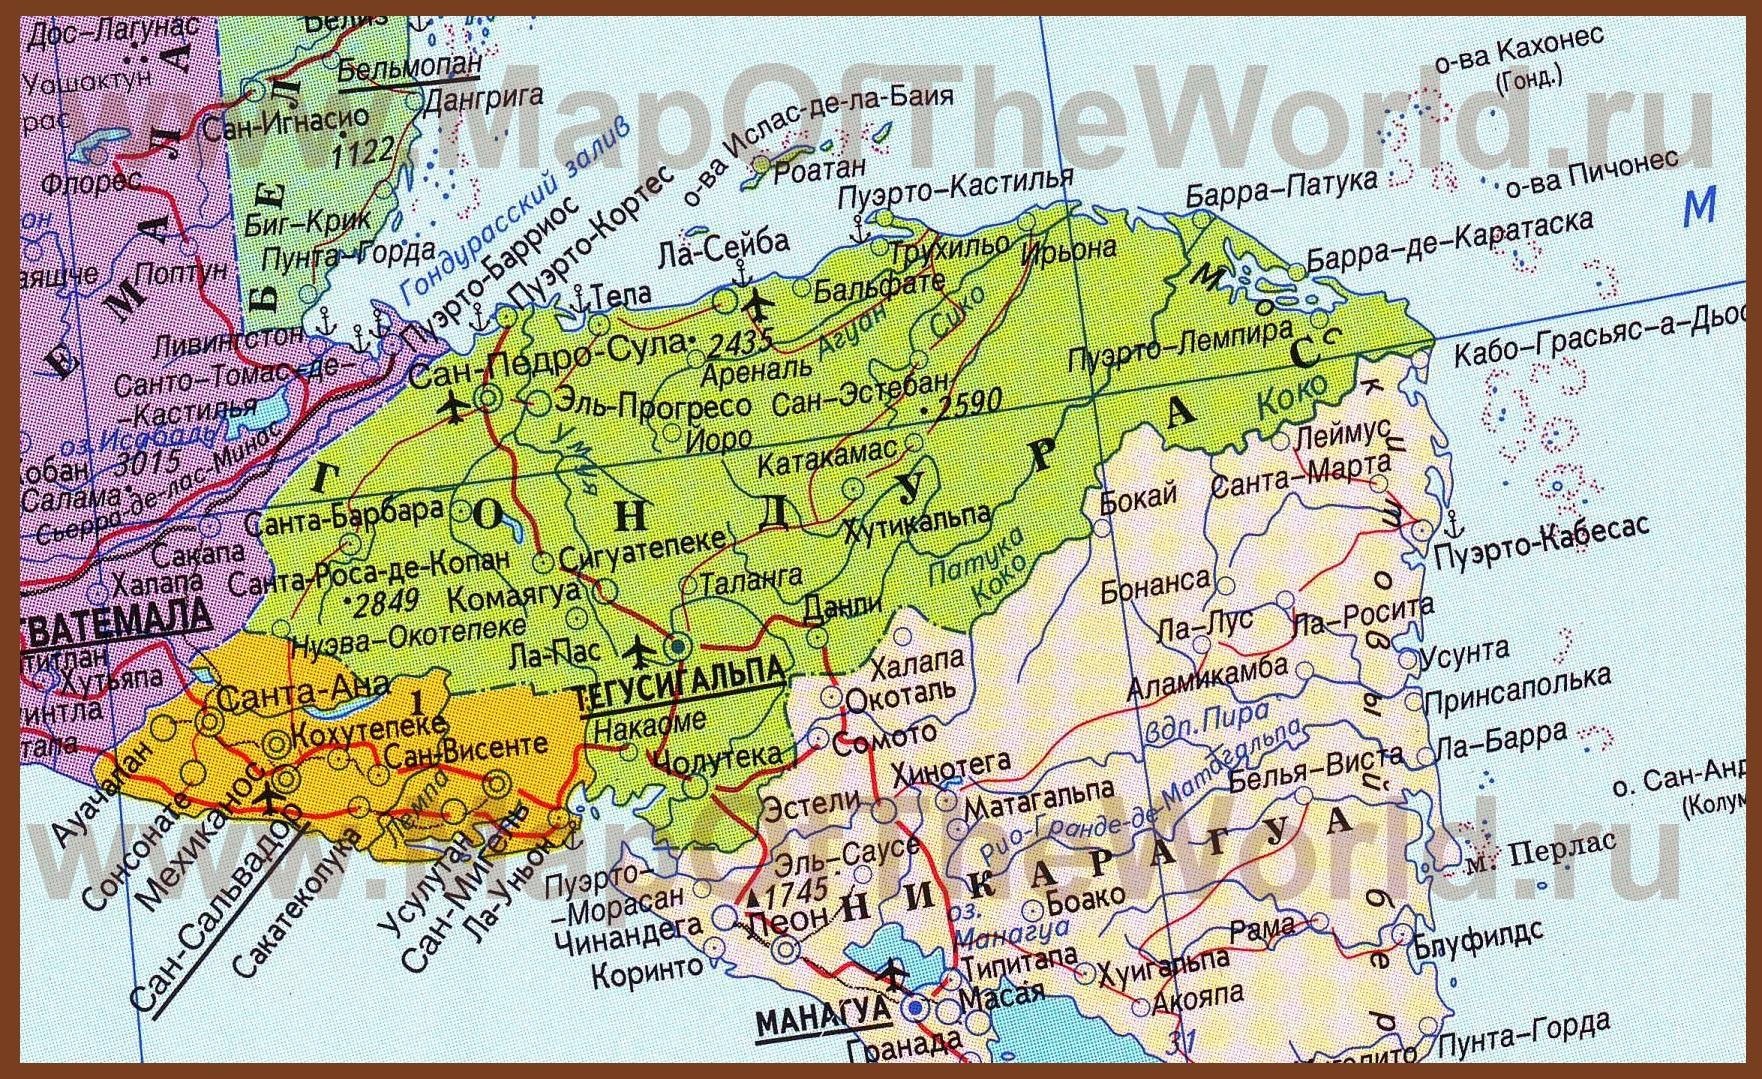 Подробная карта гондураса на русском